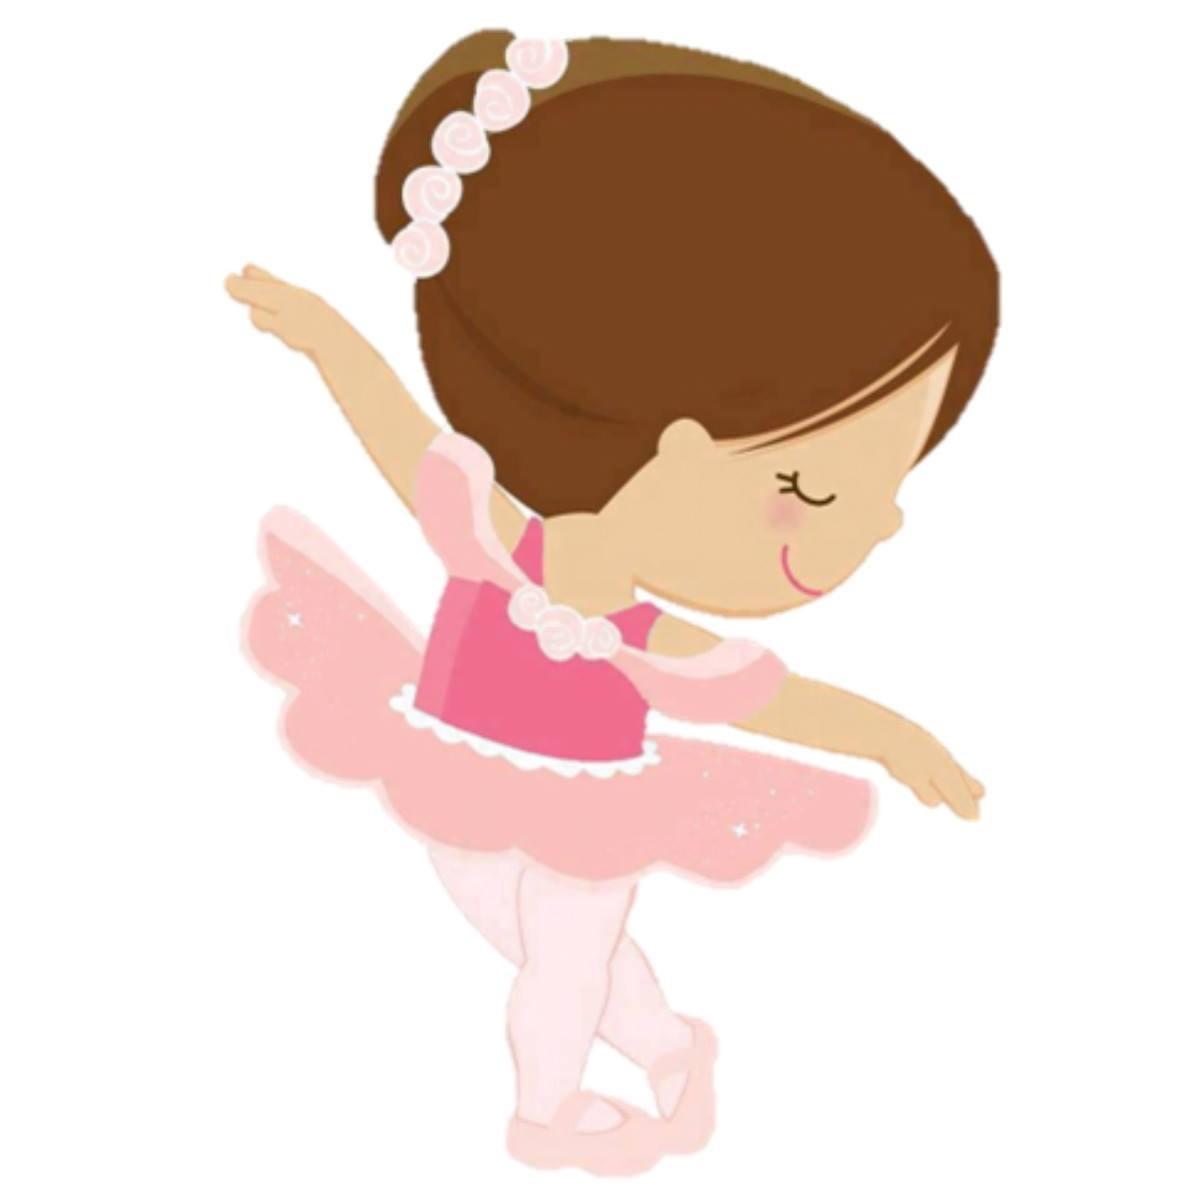 Ballerina clipart. Baby station